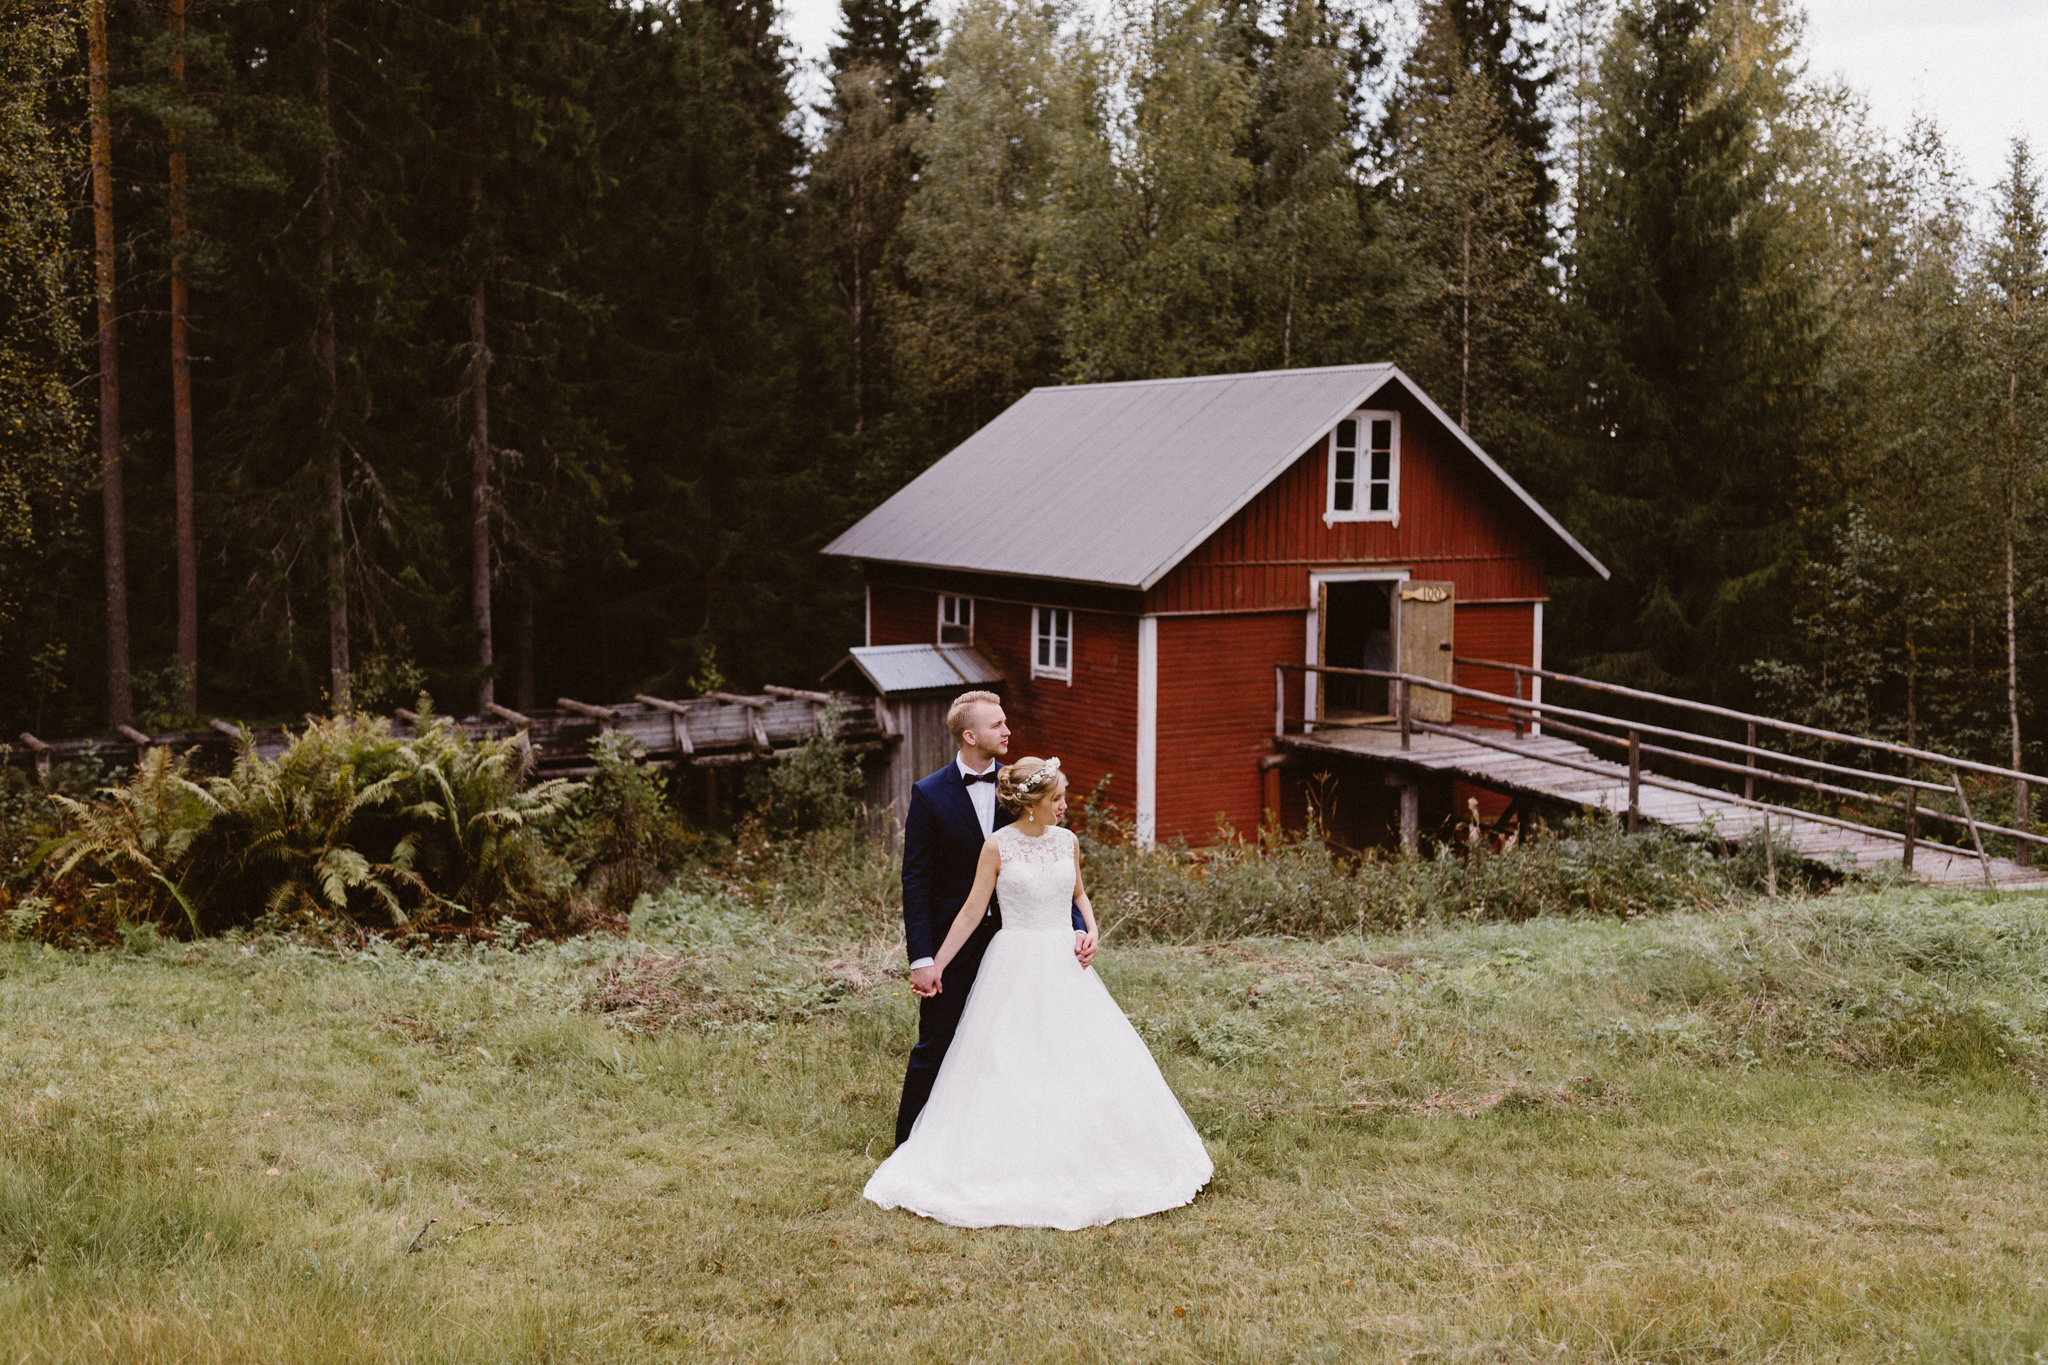 Leevi + Susanna -- Patrick Karkkolainen Wedding Photographer-243.jpg